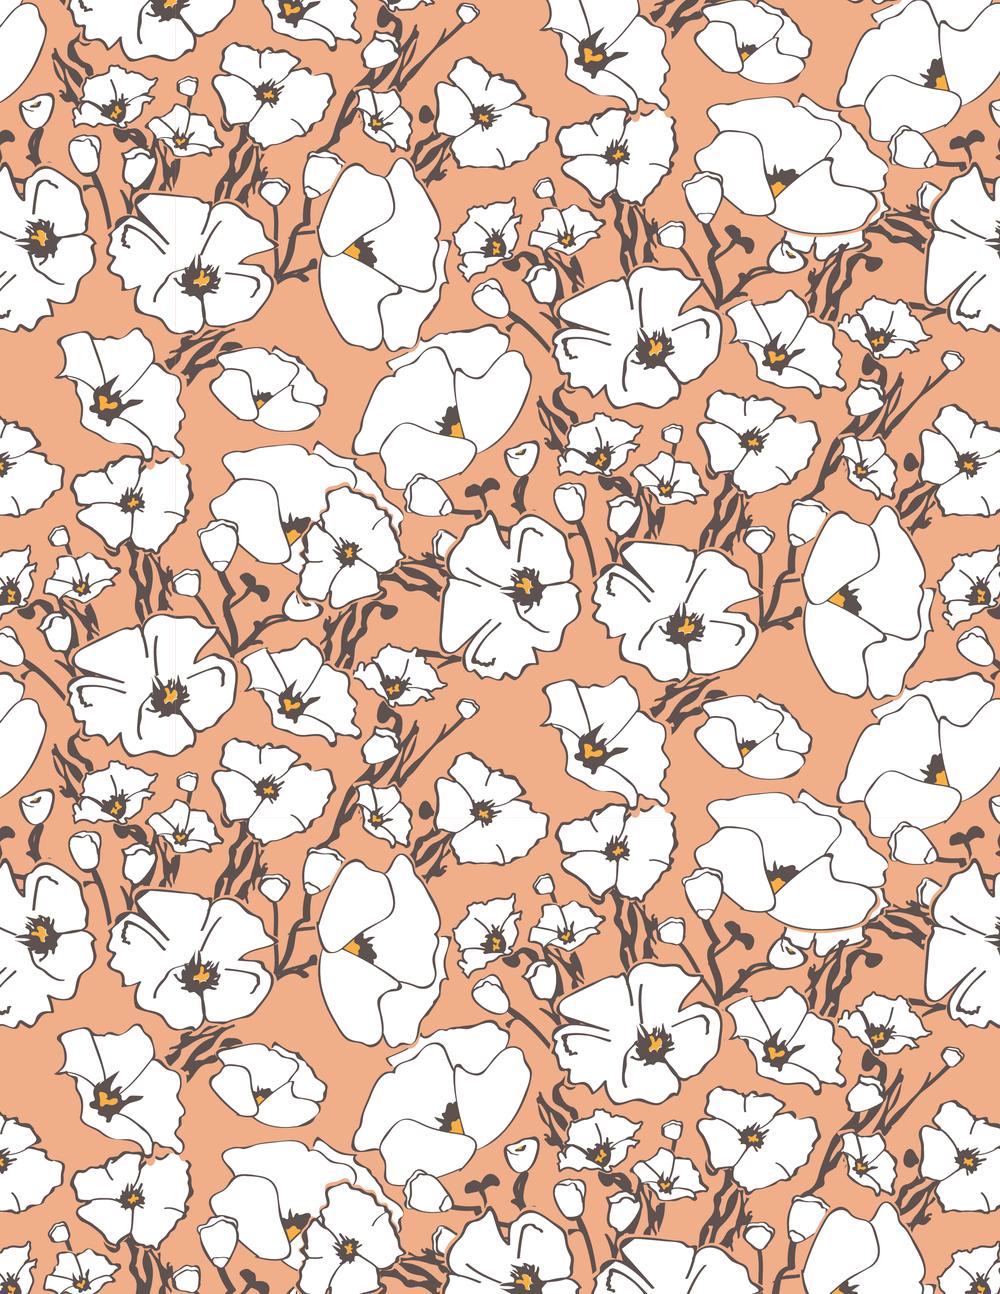 patterns_floral-05.png